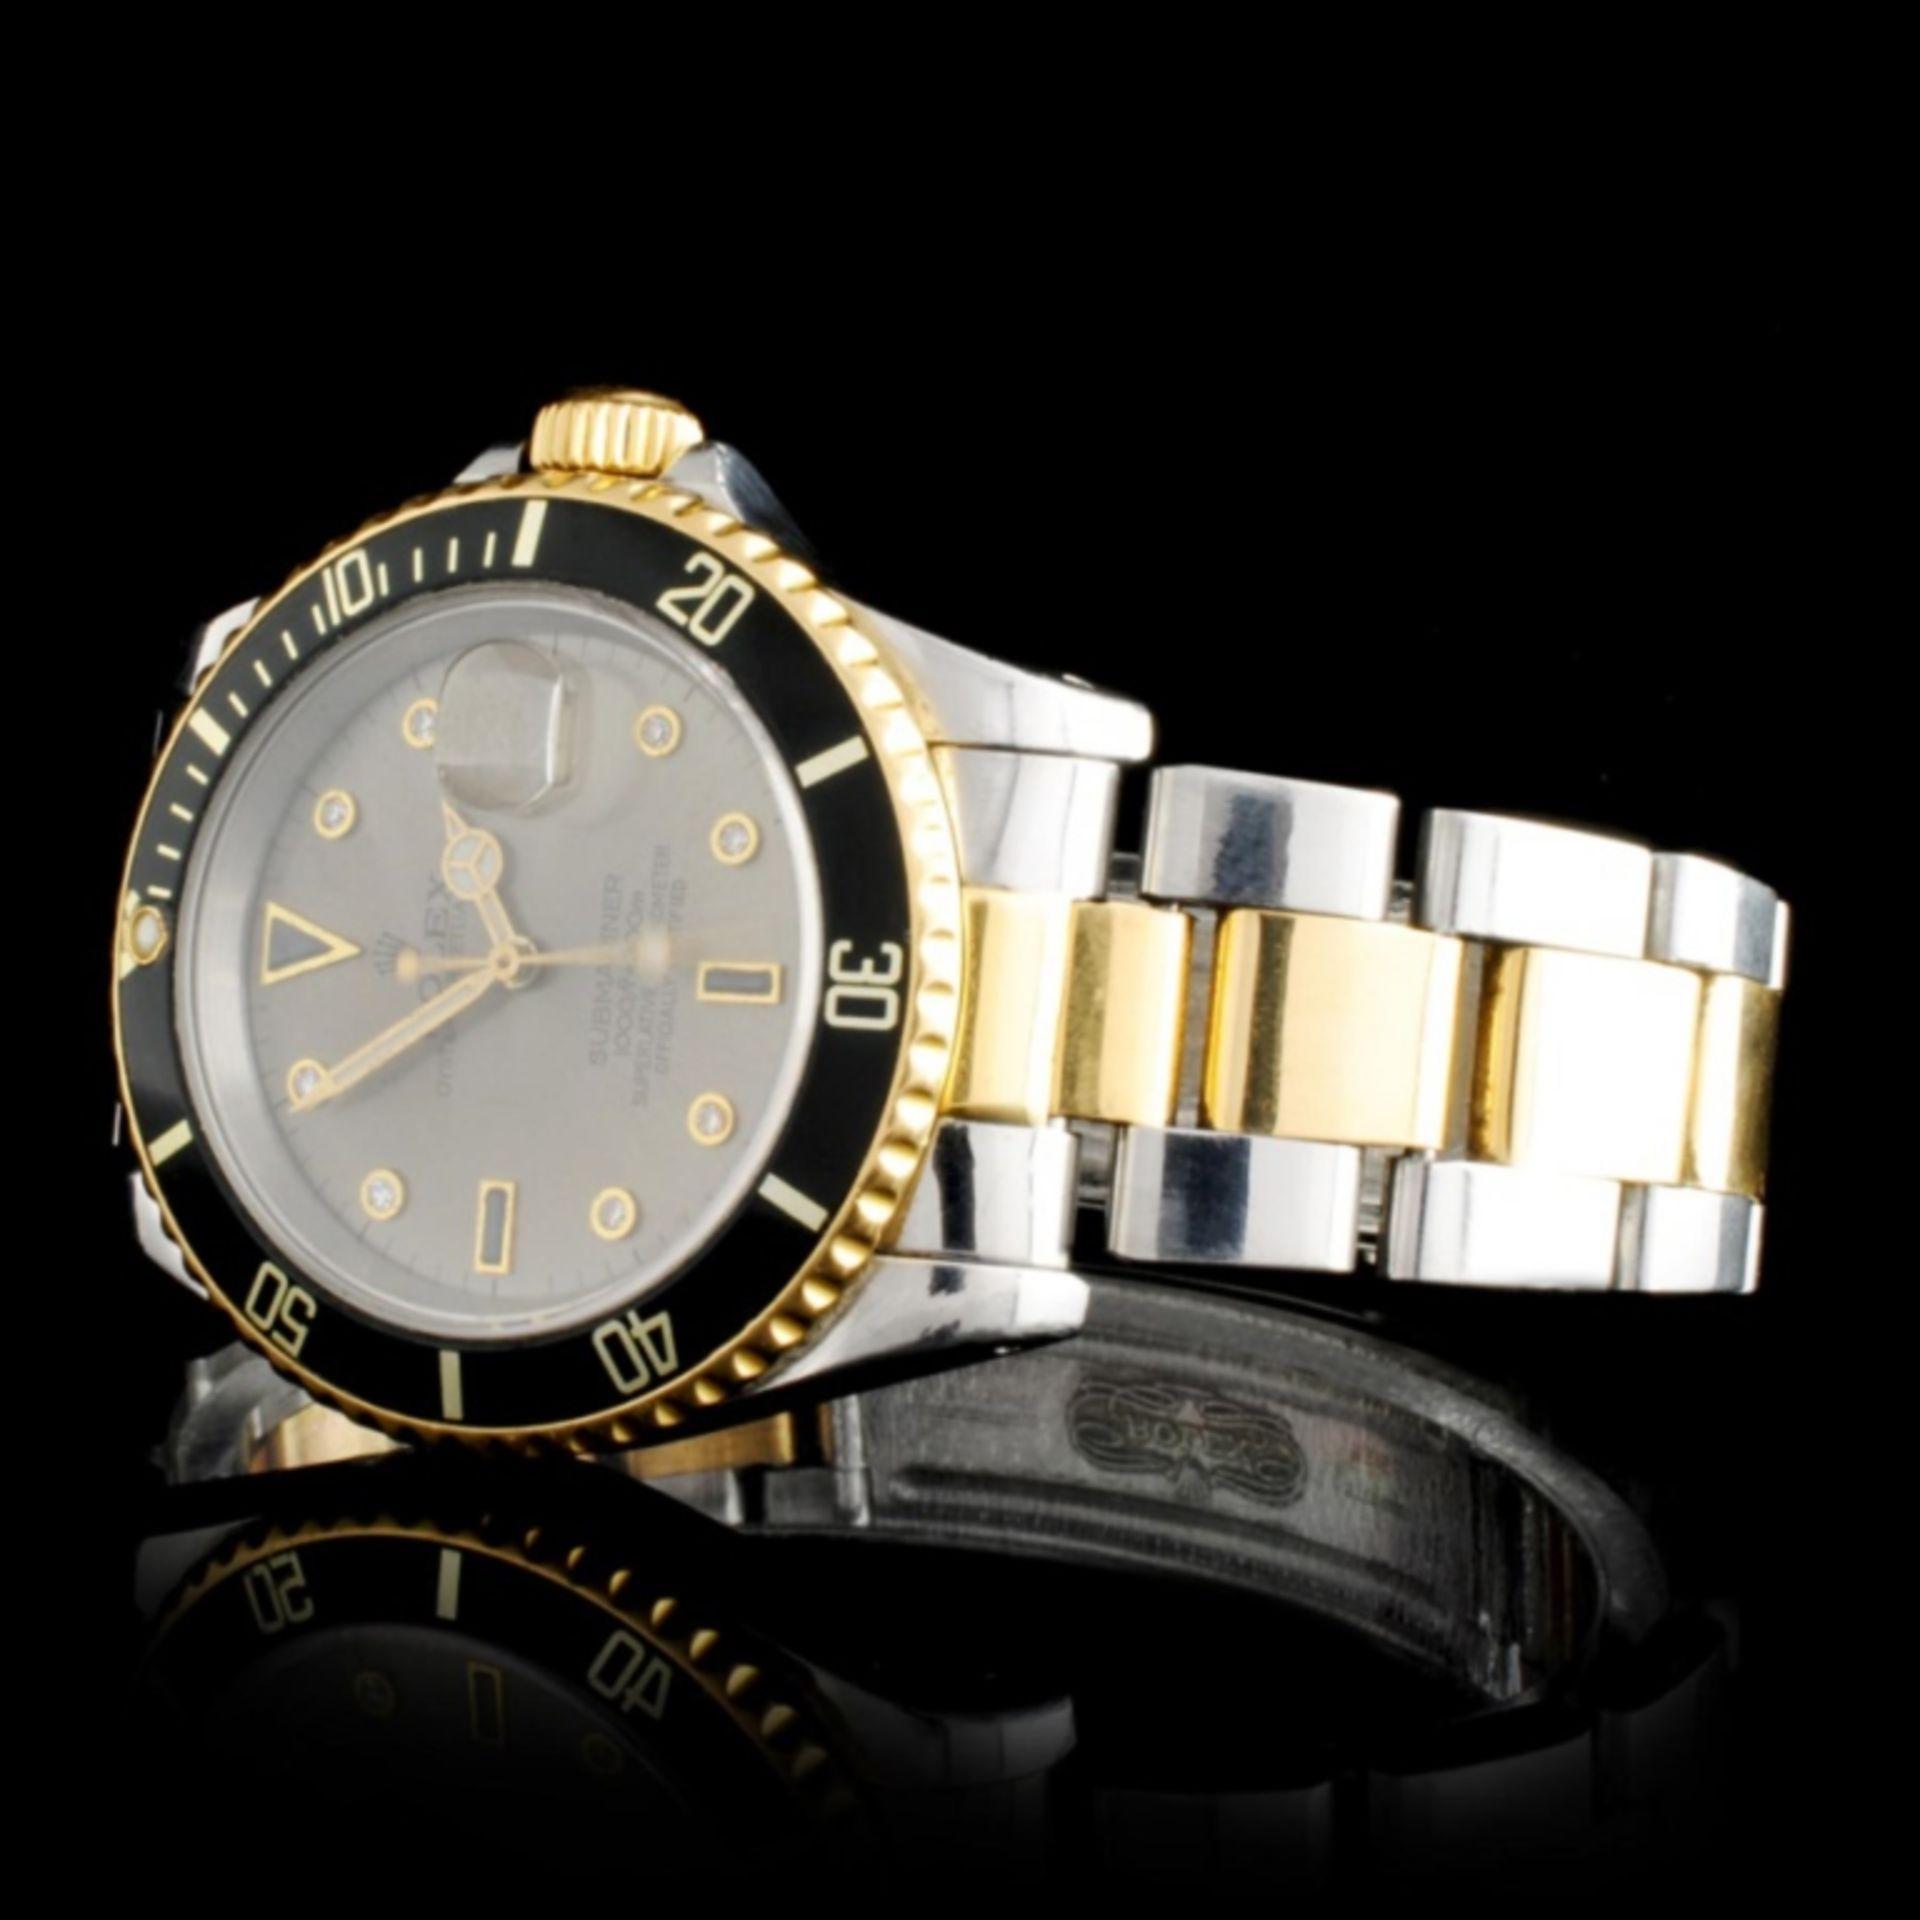 Rolex YG/SS Submariner Diamond 40MM Watch - Image 2 of 5